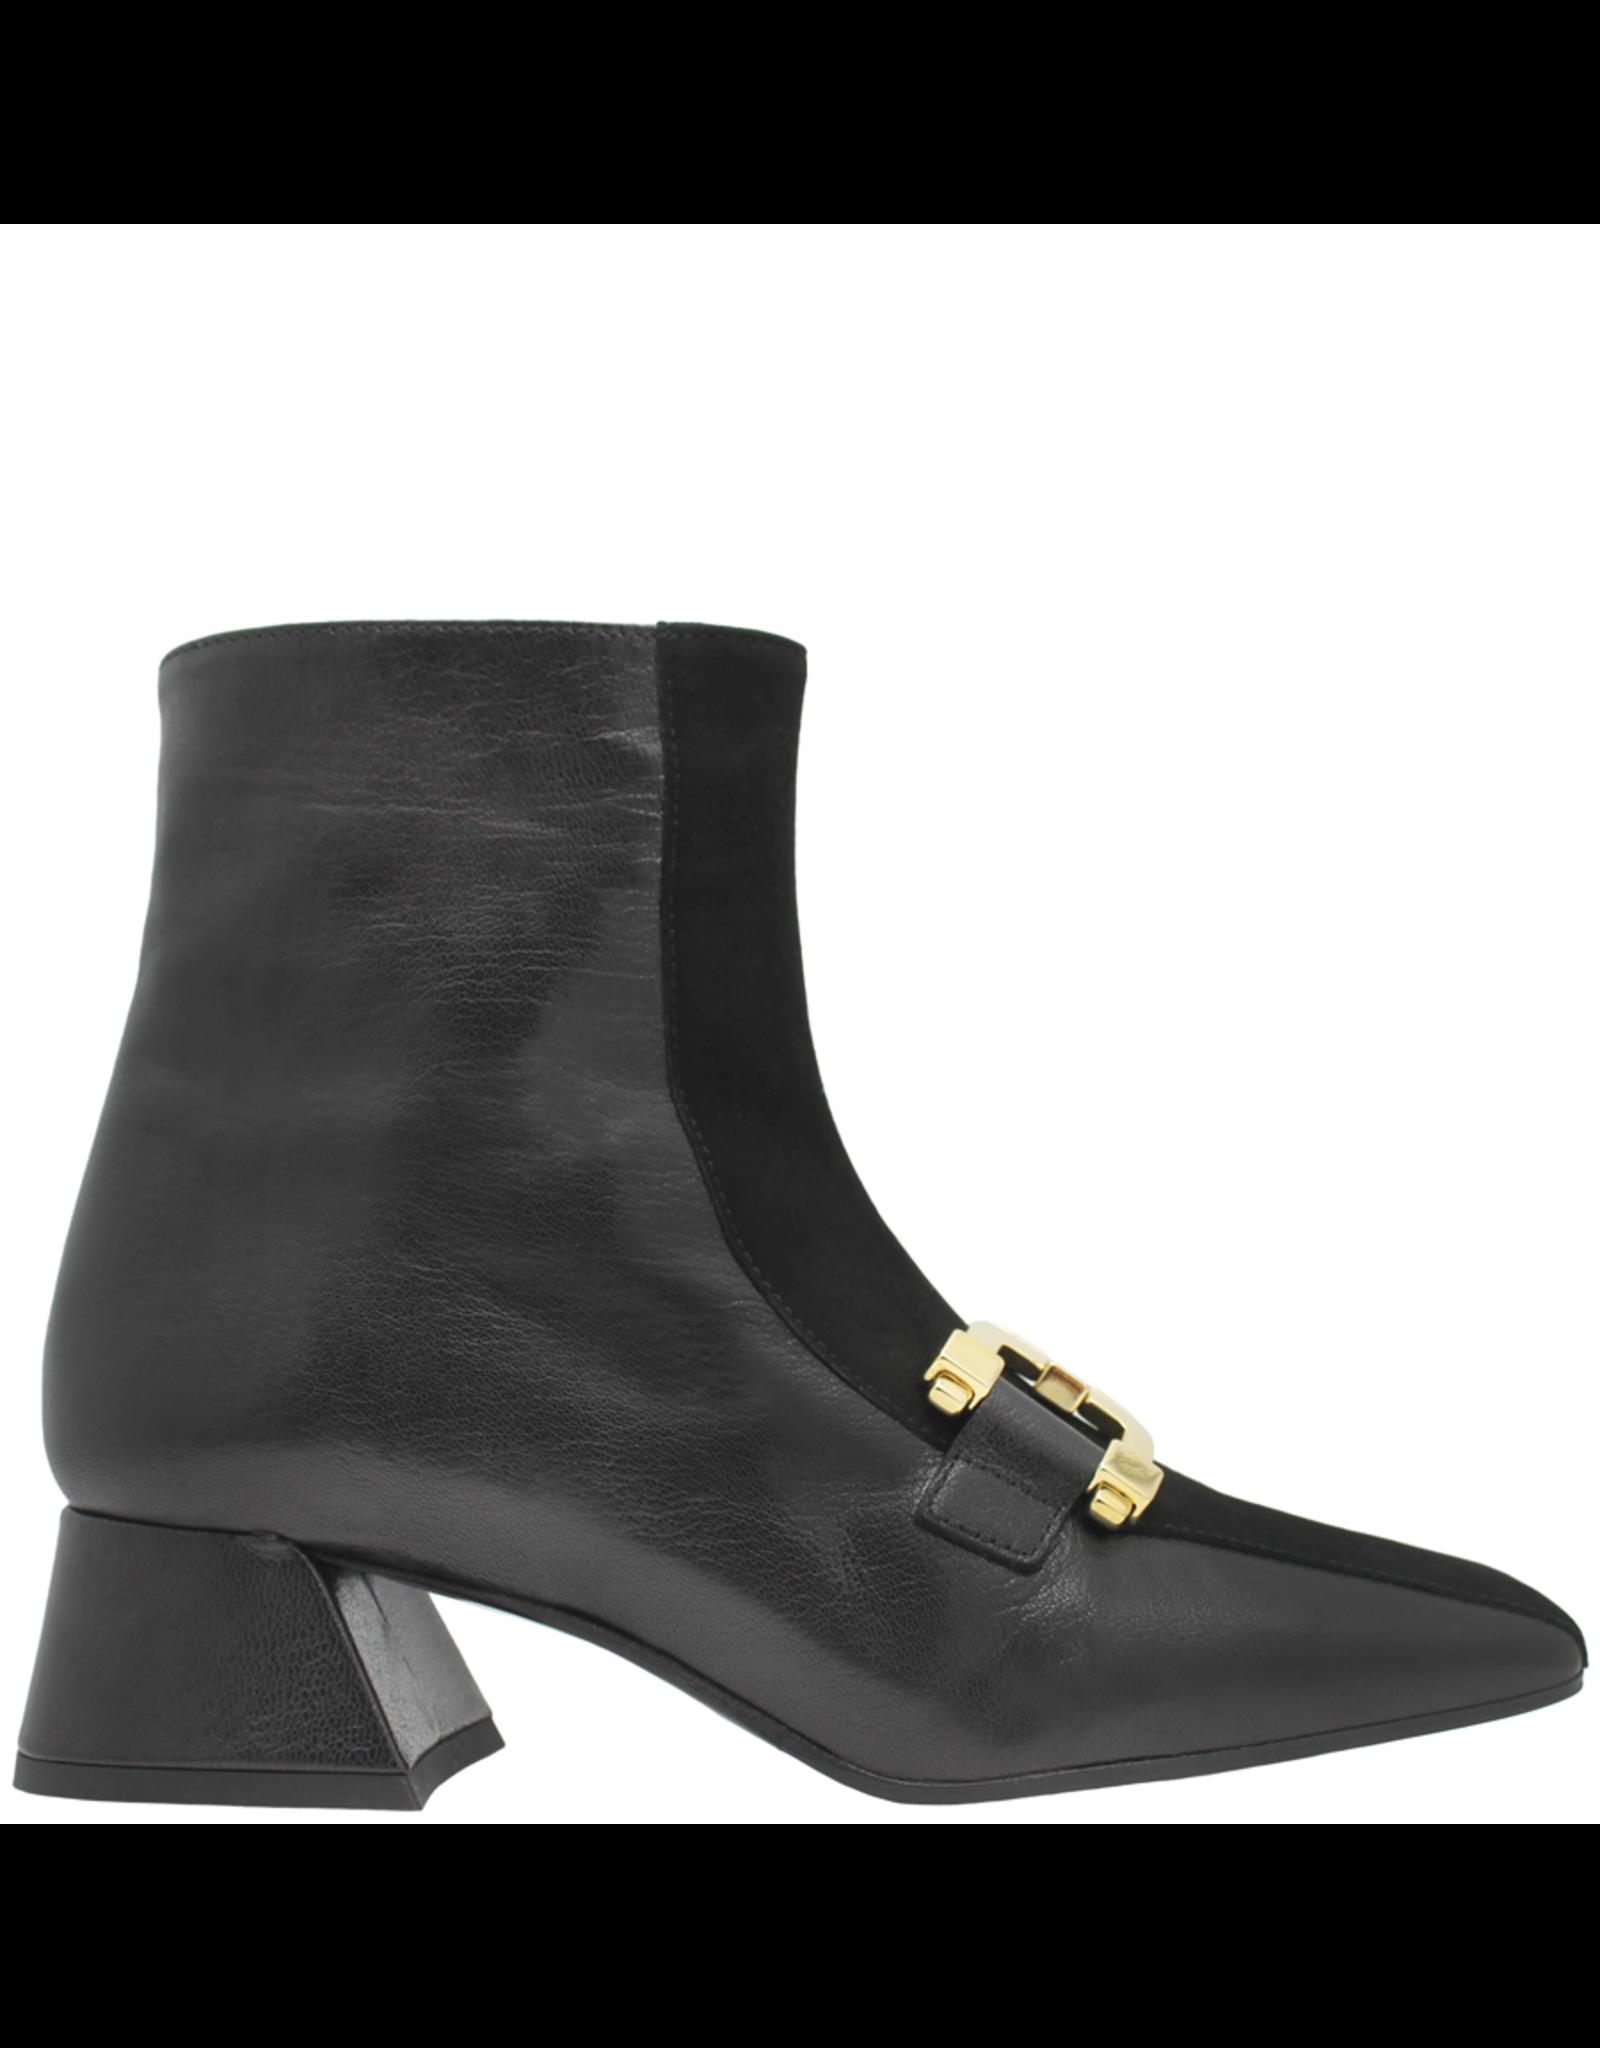 ModadiFausto ModadiFausto Black Square Toe Ankle Boot With Gold 6367